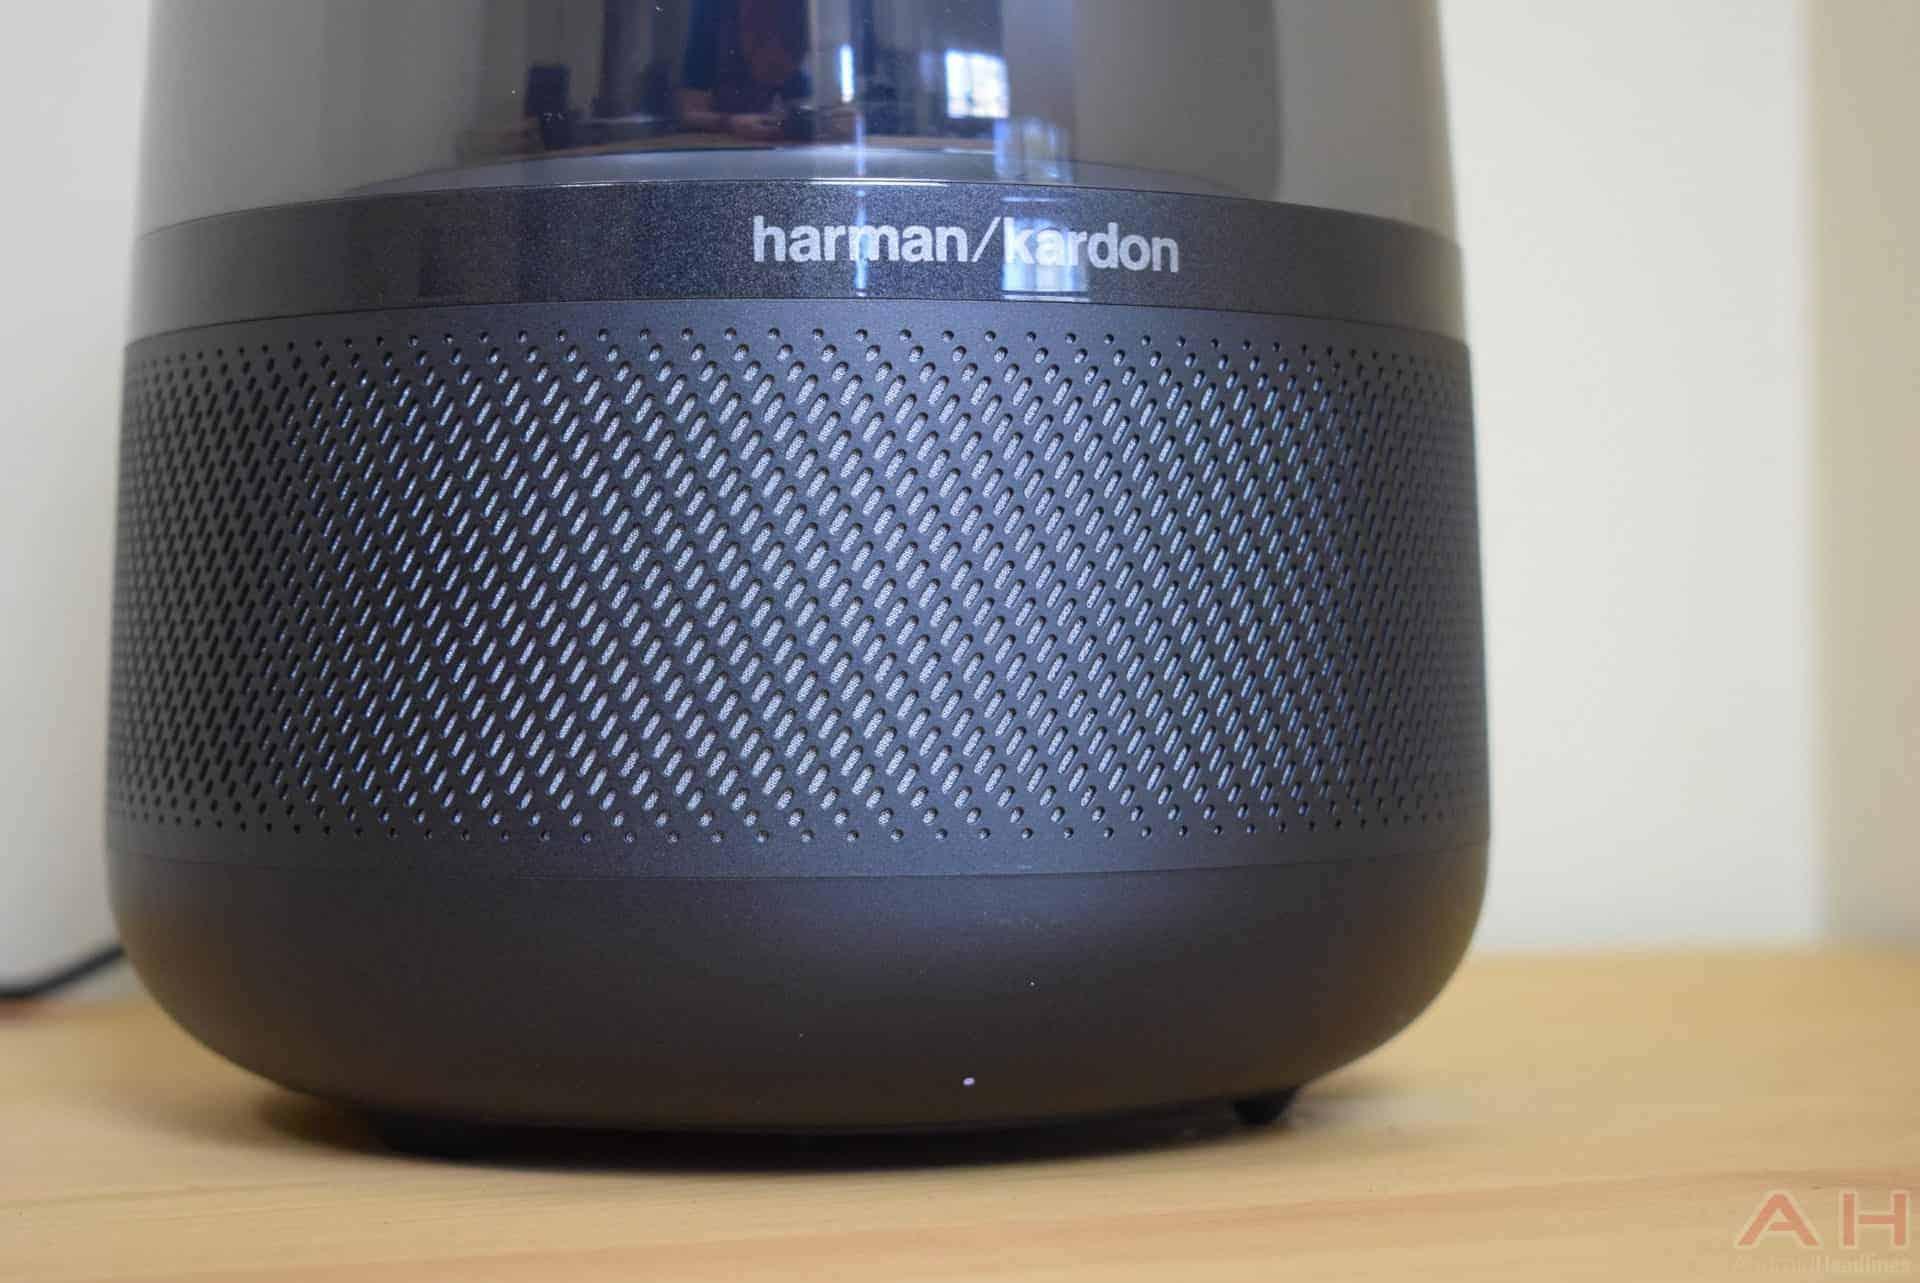 Harman Kardon Allure Review AM AH 4